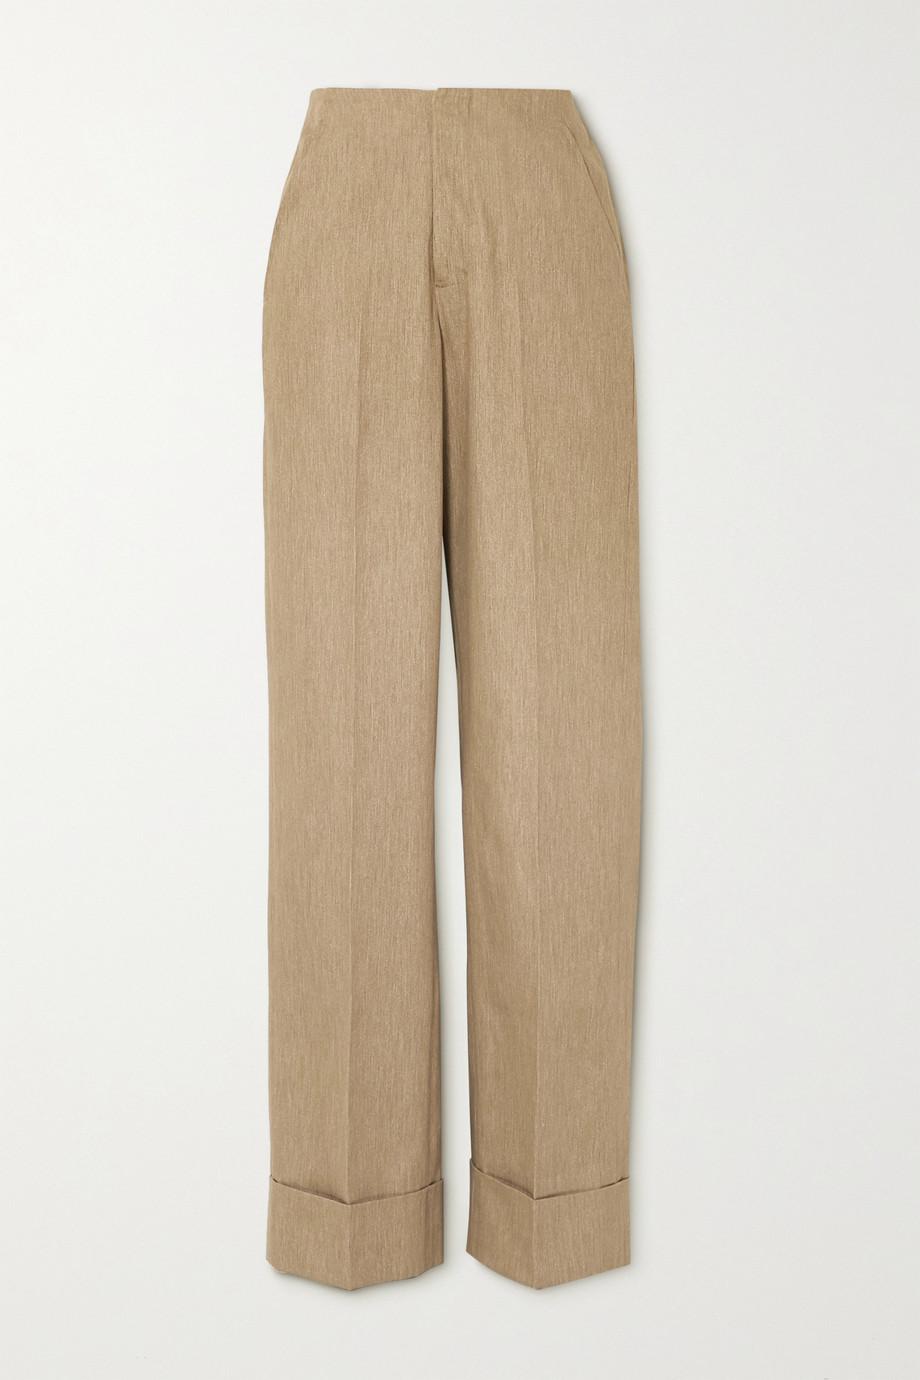 King & Tuckfield Cotton wide-leg pants